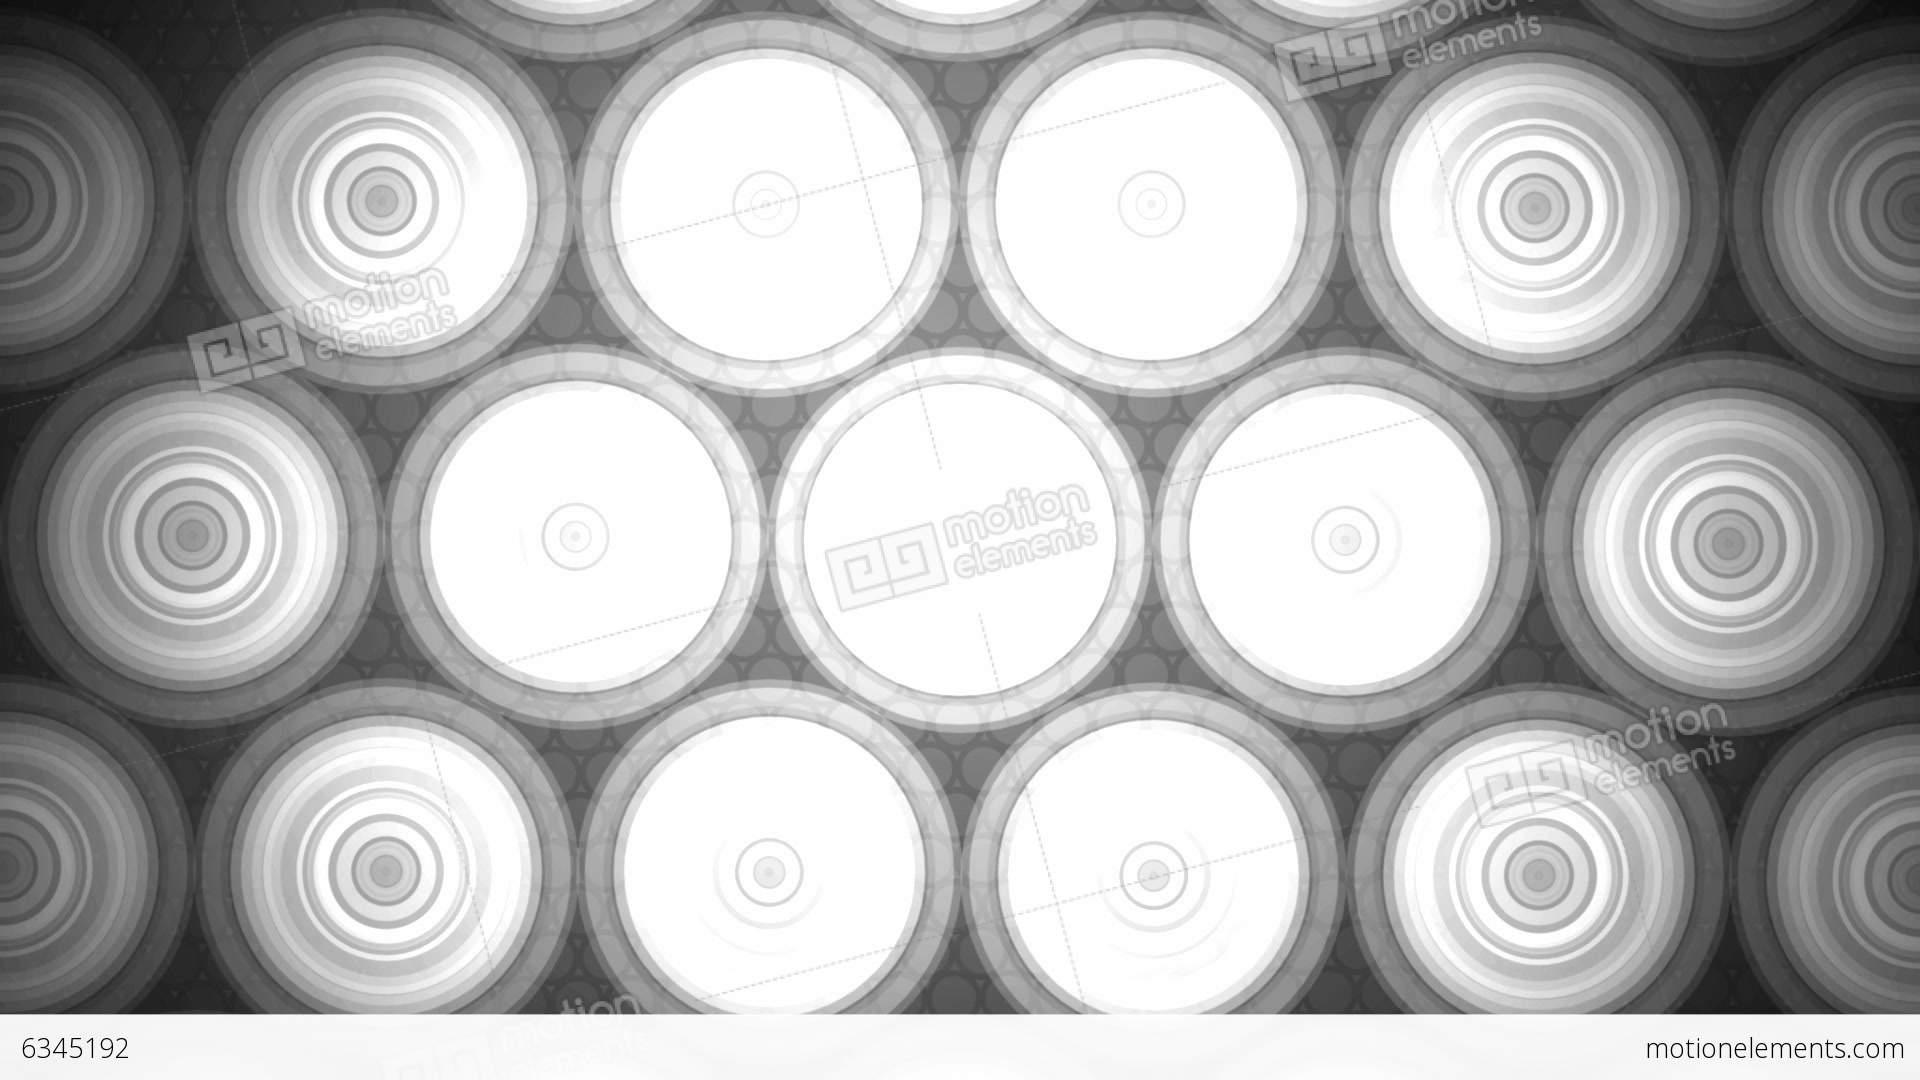 Circle Tiles Grayscale Circle Tiles Stock Animation Royalty Free Stock